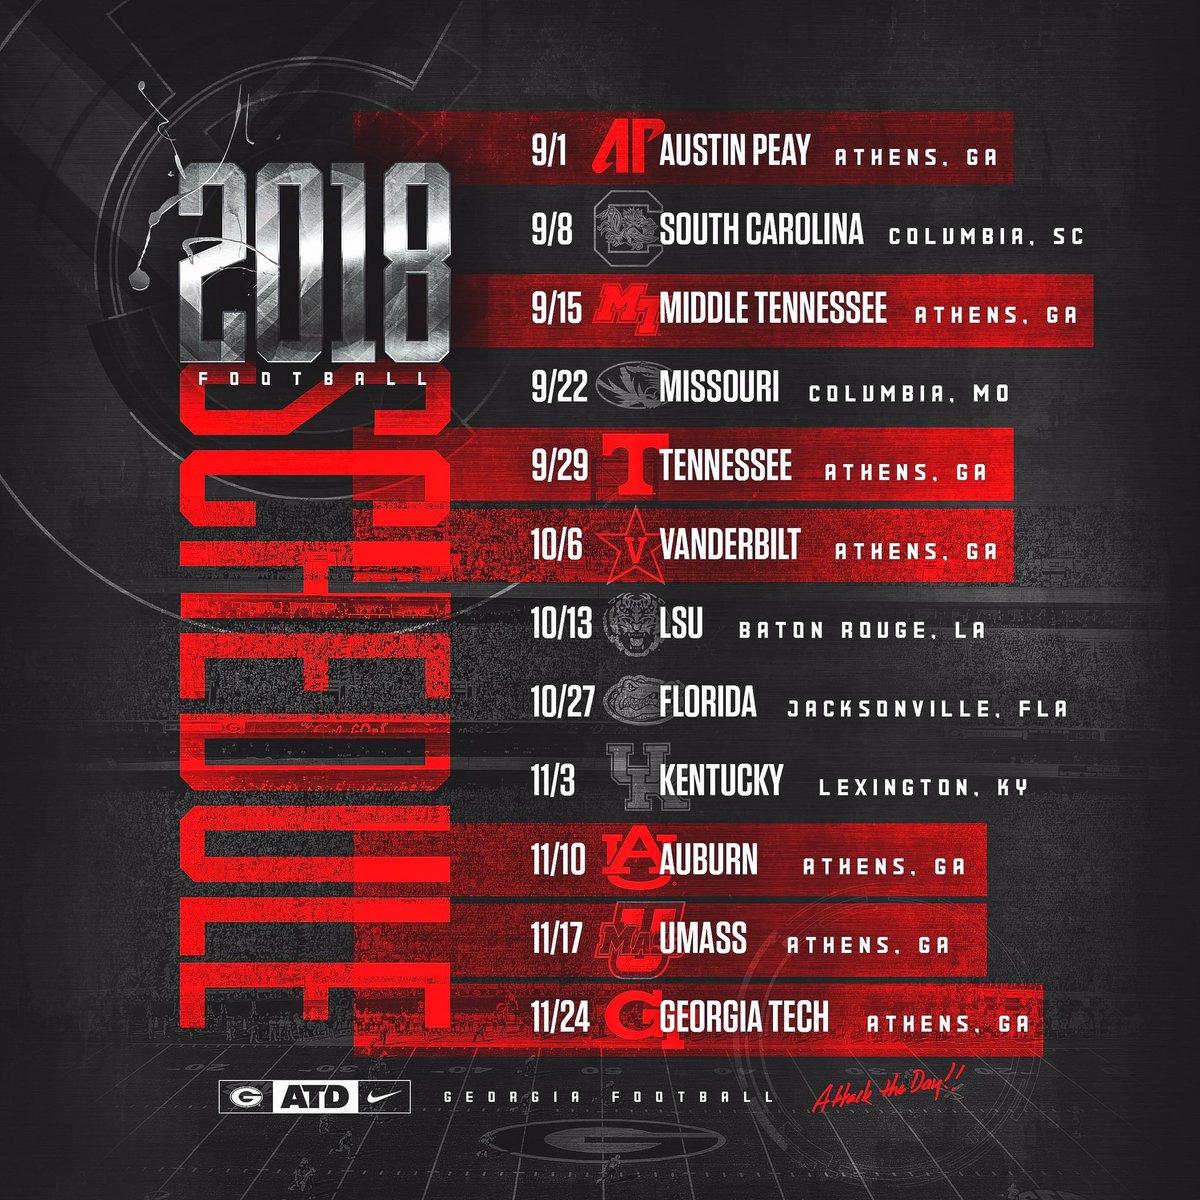 University Of Georgia 2019 Football Schedule Logan Booker on Twitter: